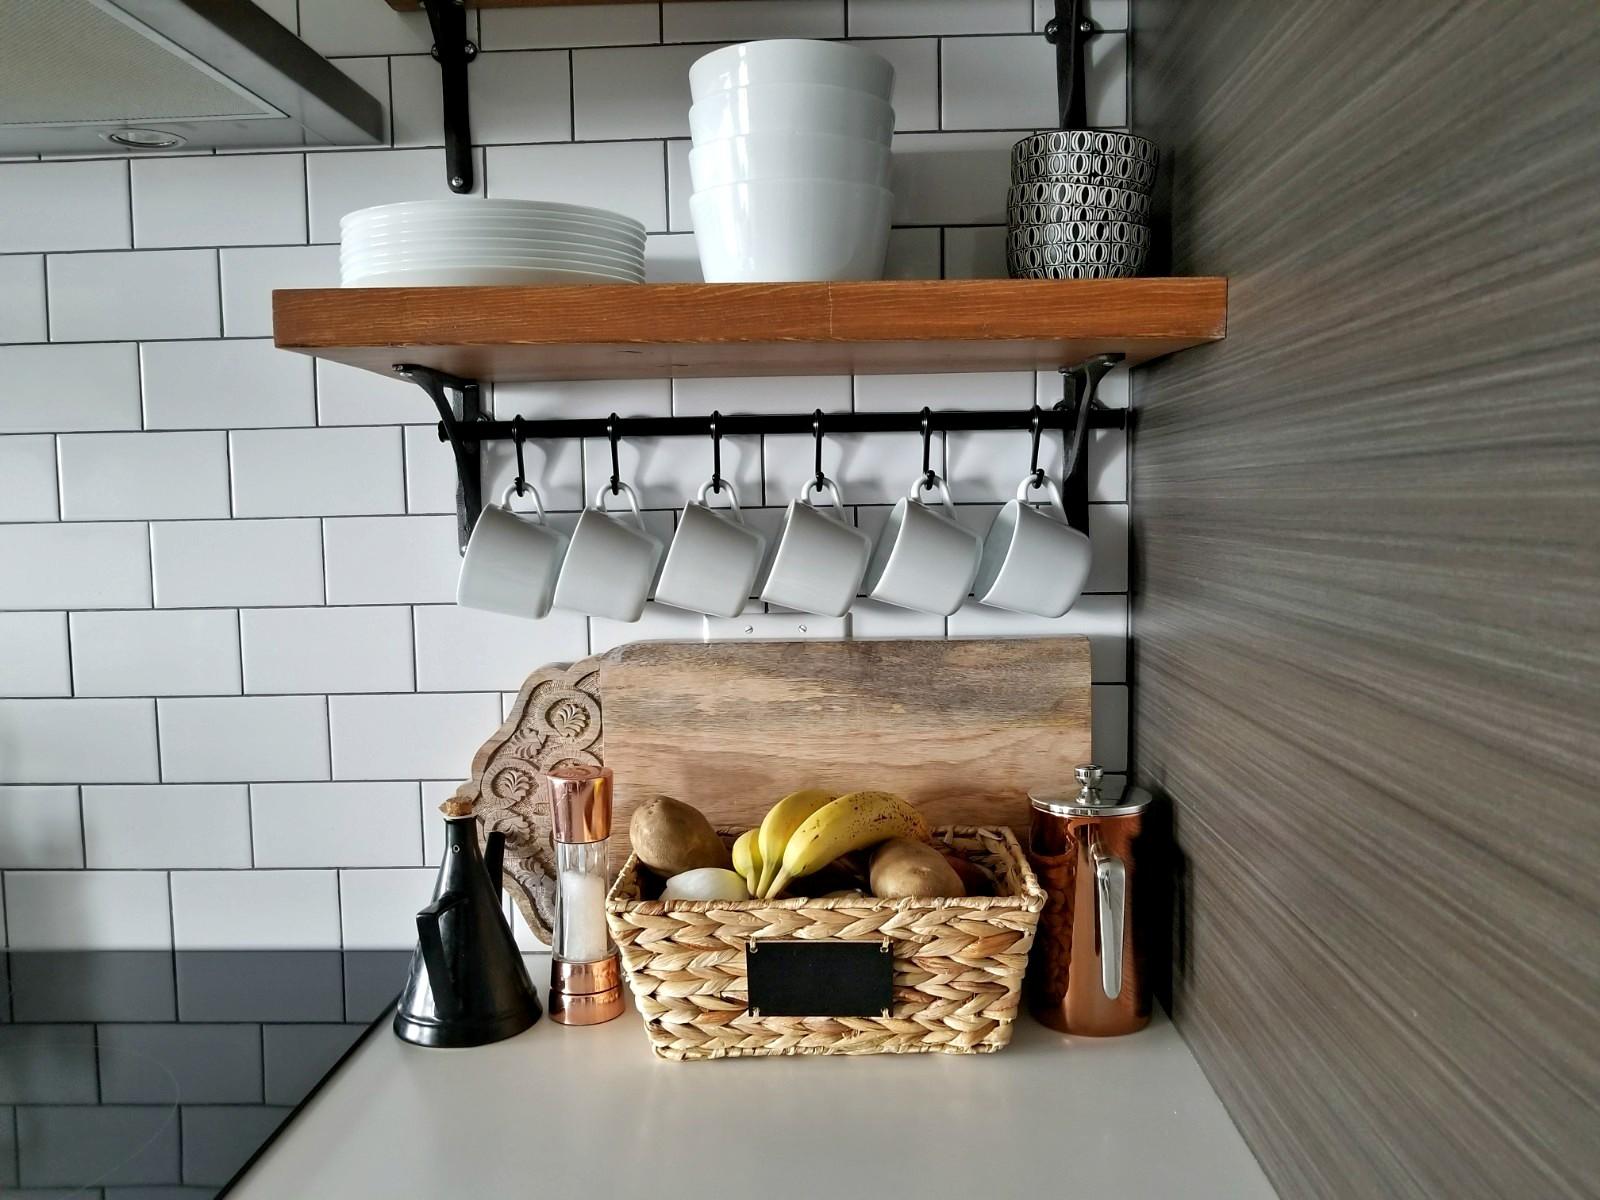 Kitchen organizers mug hangers